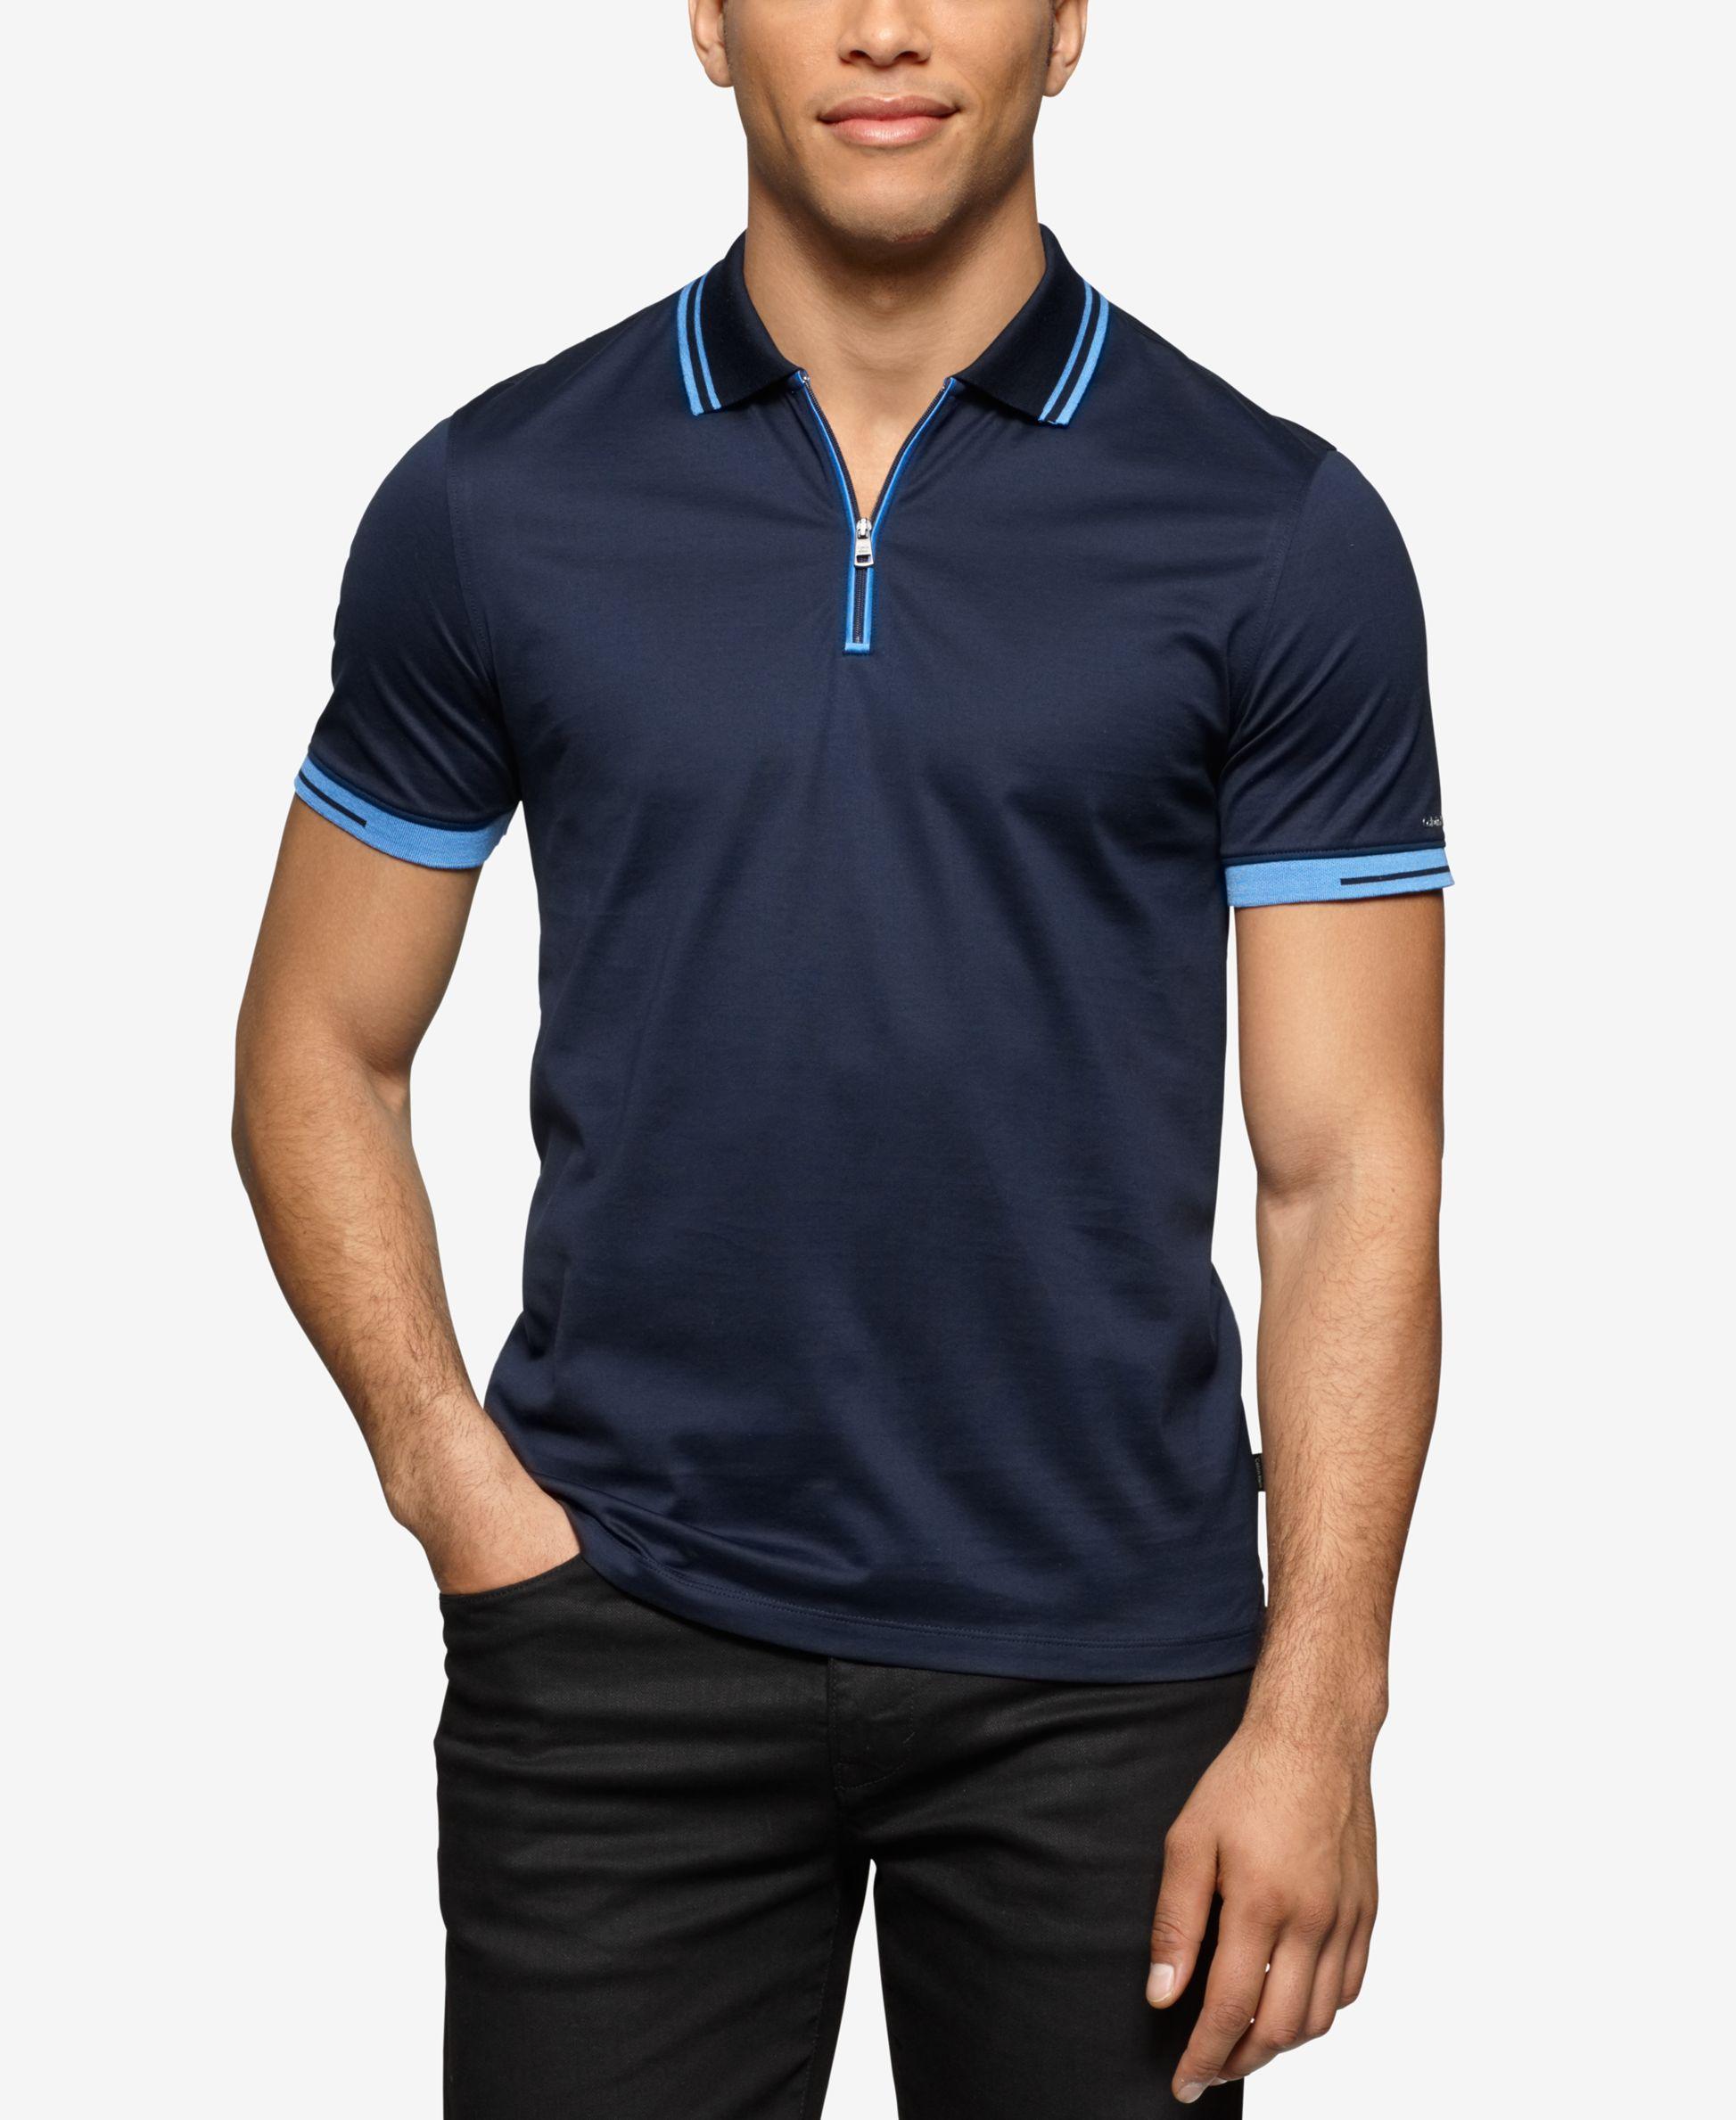 Calvin Klein Men's Slim-Fit Quarter-Zip Polo - Polos - Men - Macy's